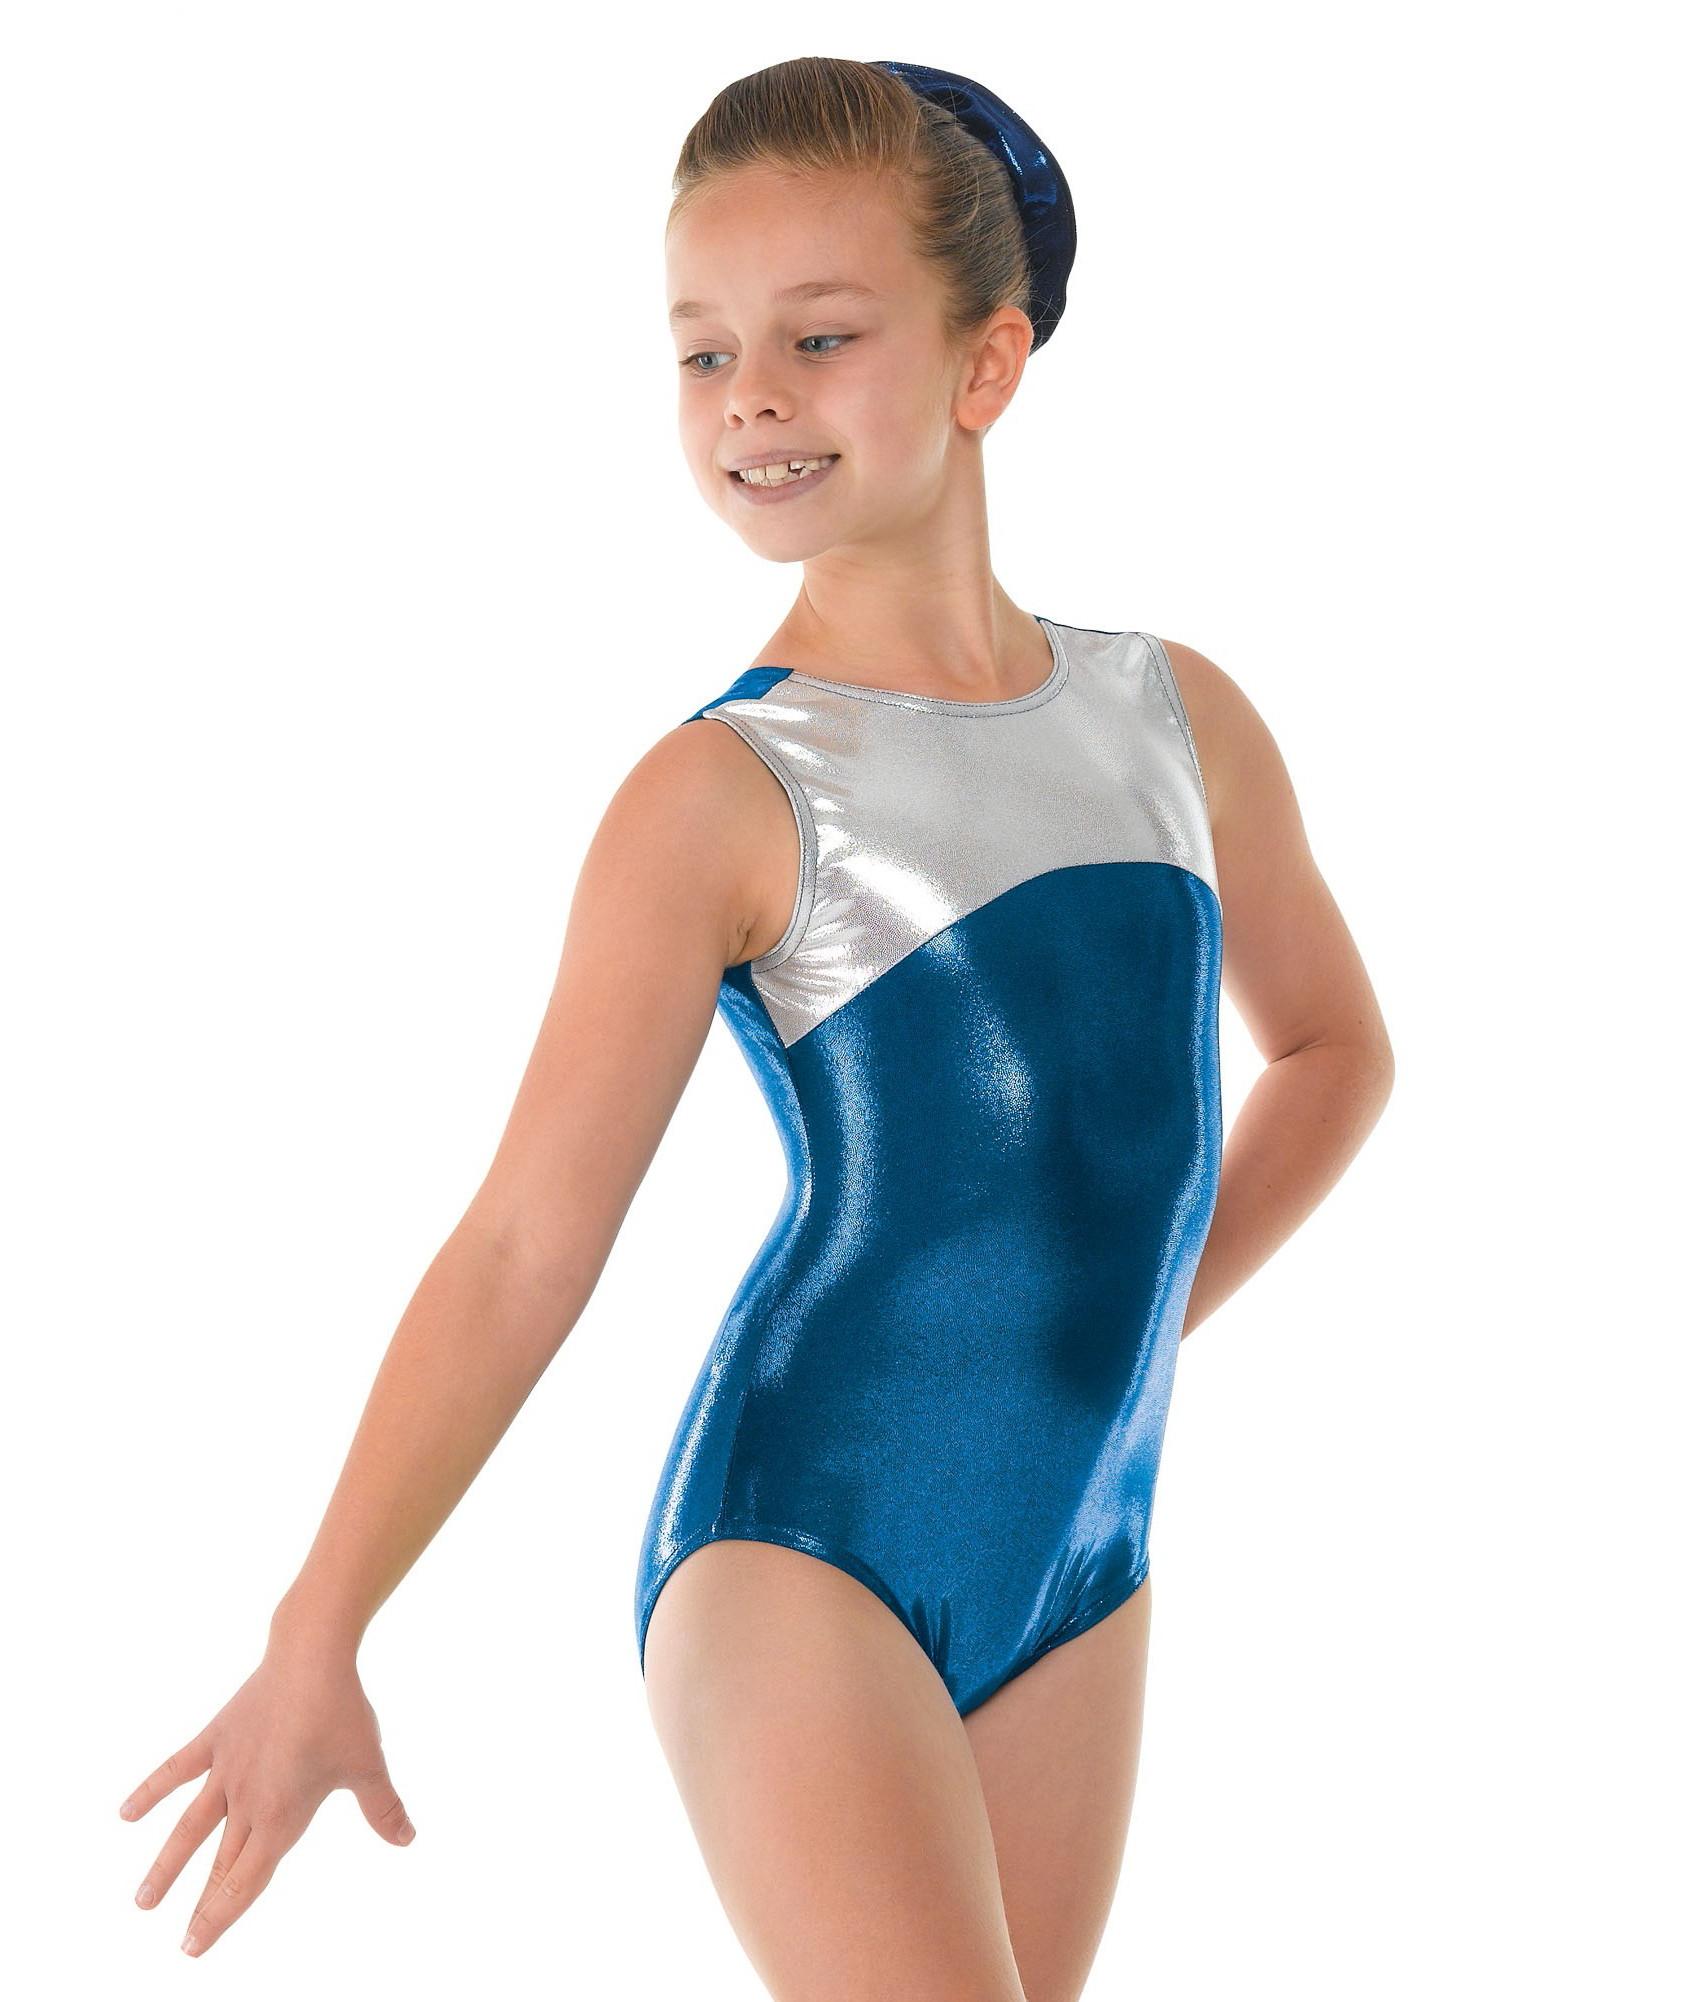 623566d62e0f Shine Sleeveless Gymnastic Leotard - Dancewear Universe